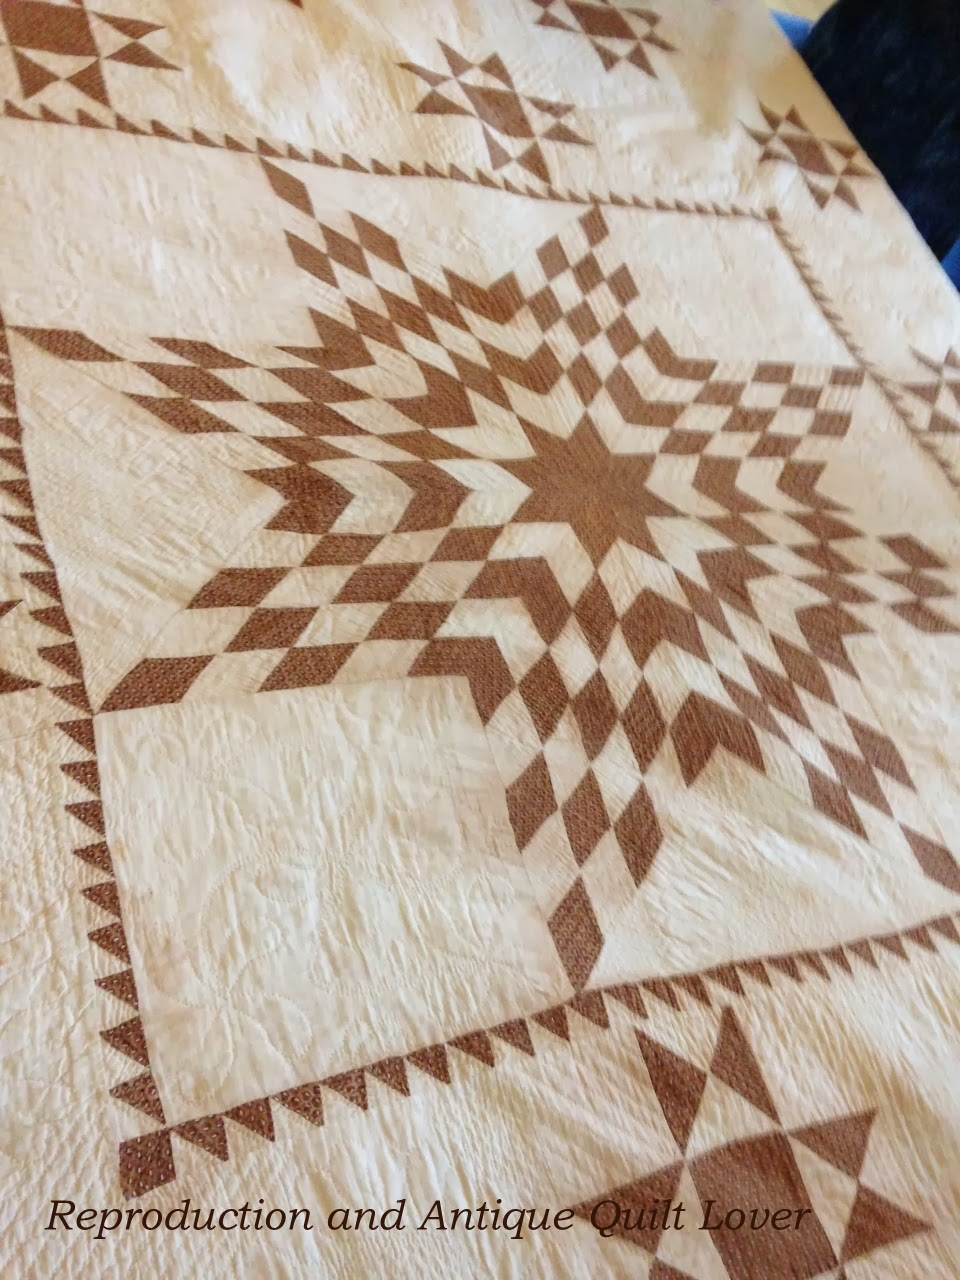 Repro Quilt Lover: Stars Fragmented : repro quilt lover - Adamdwight.com